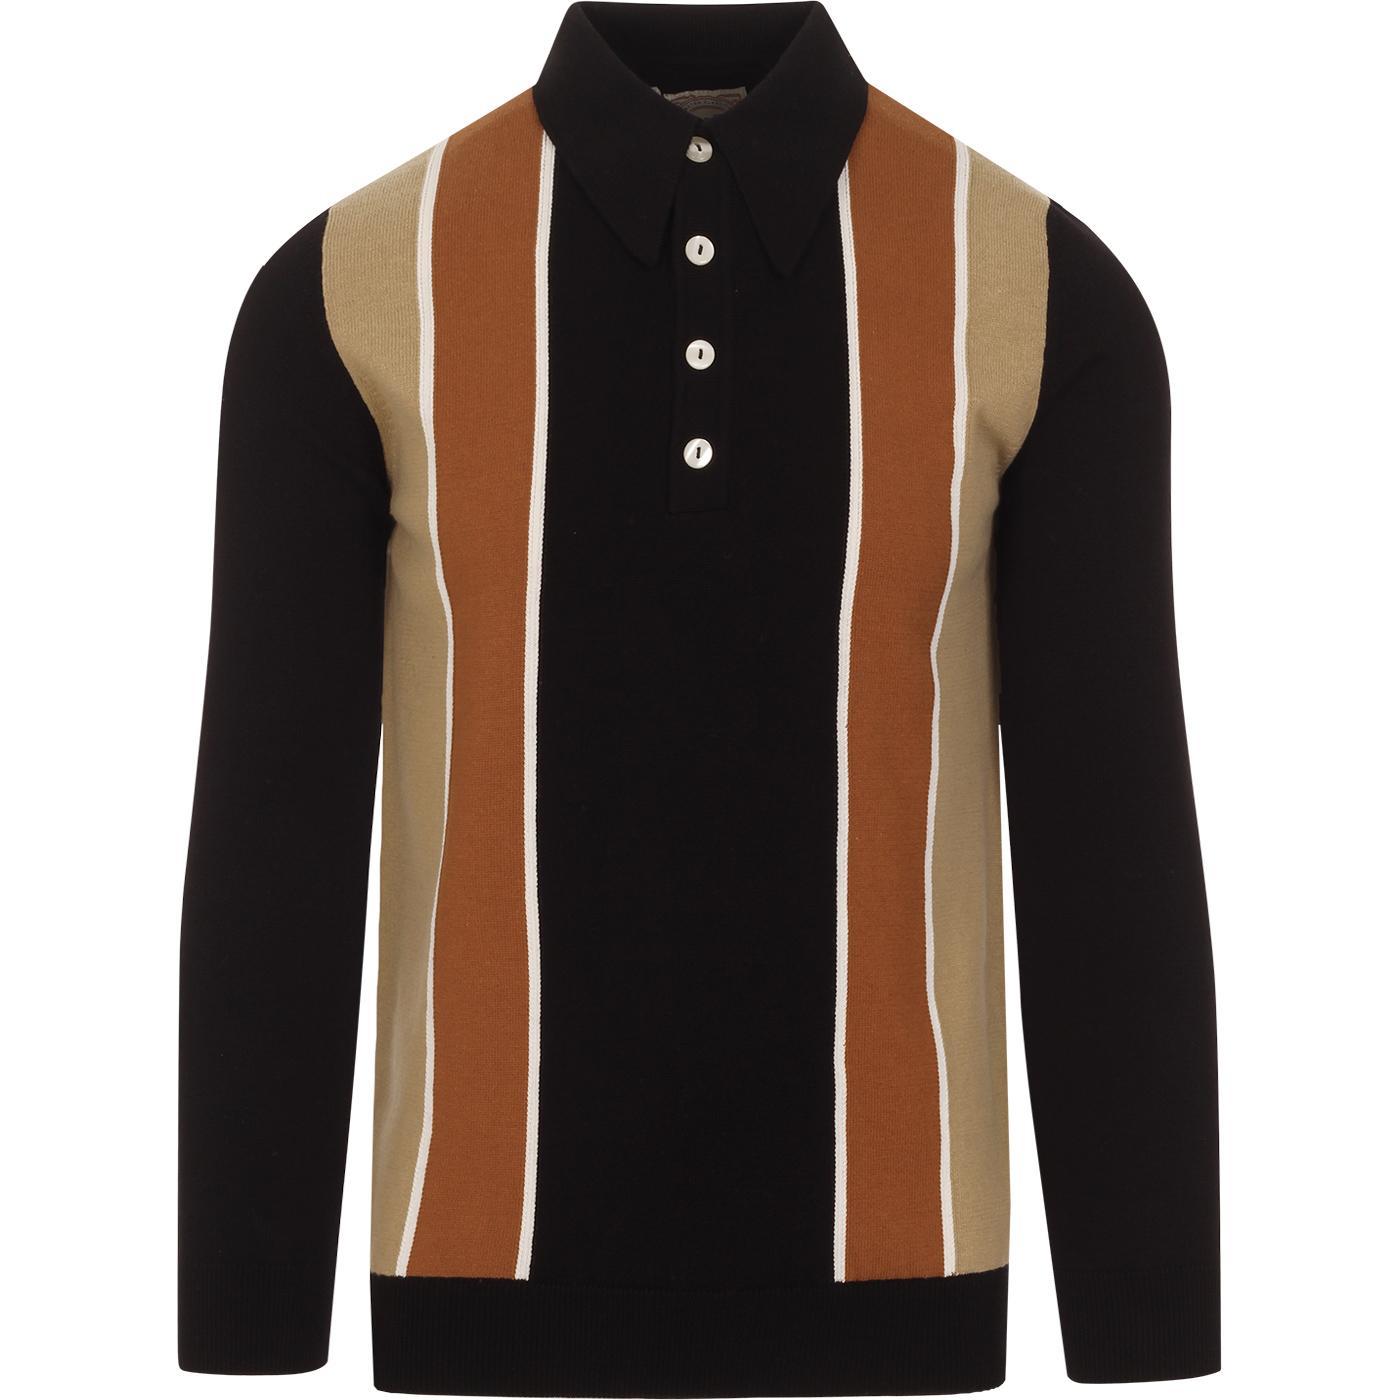 SKA & SOUL Vintage Americana Stripe Knit Polo (B)